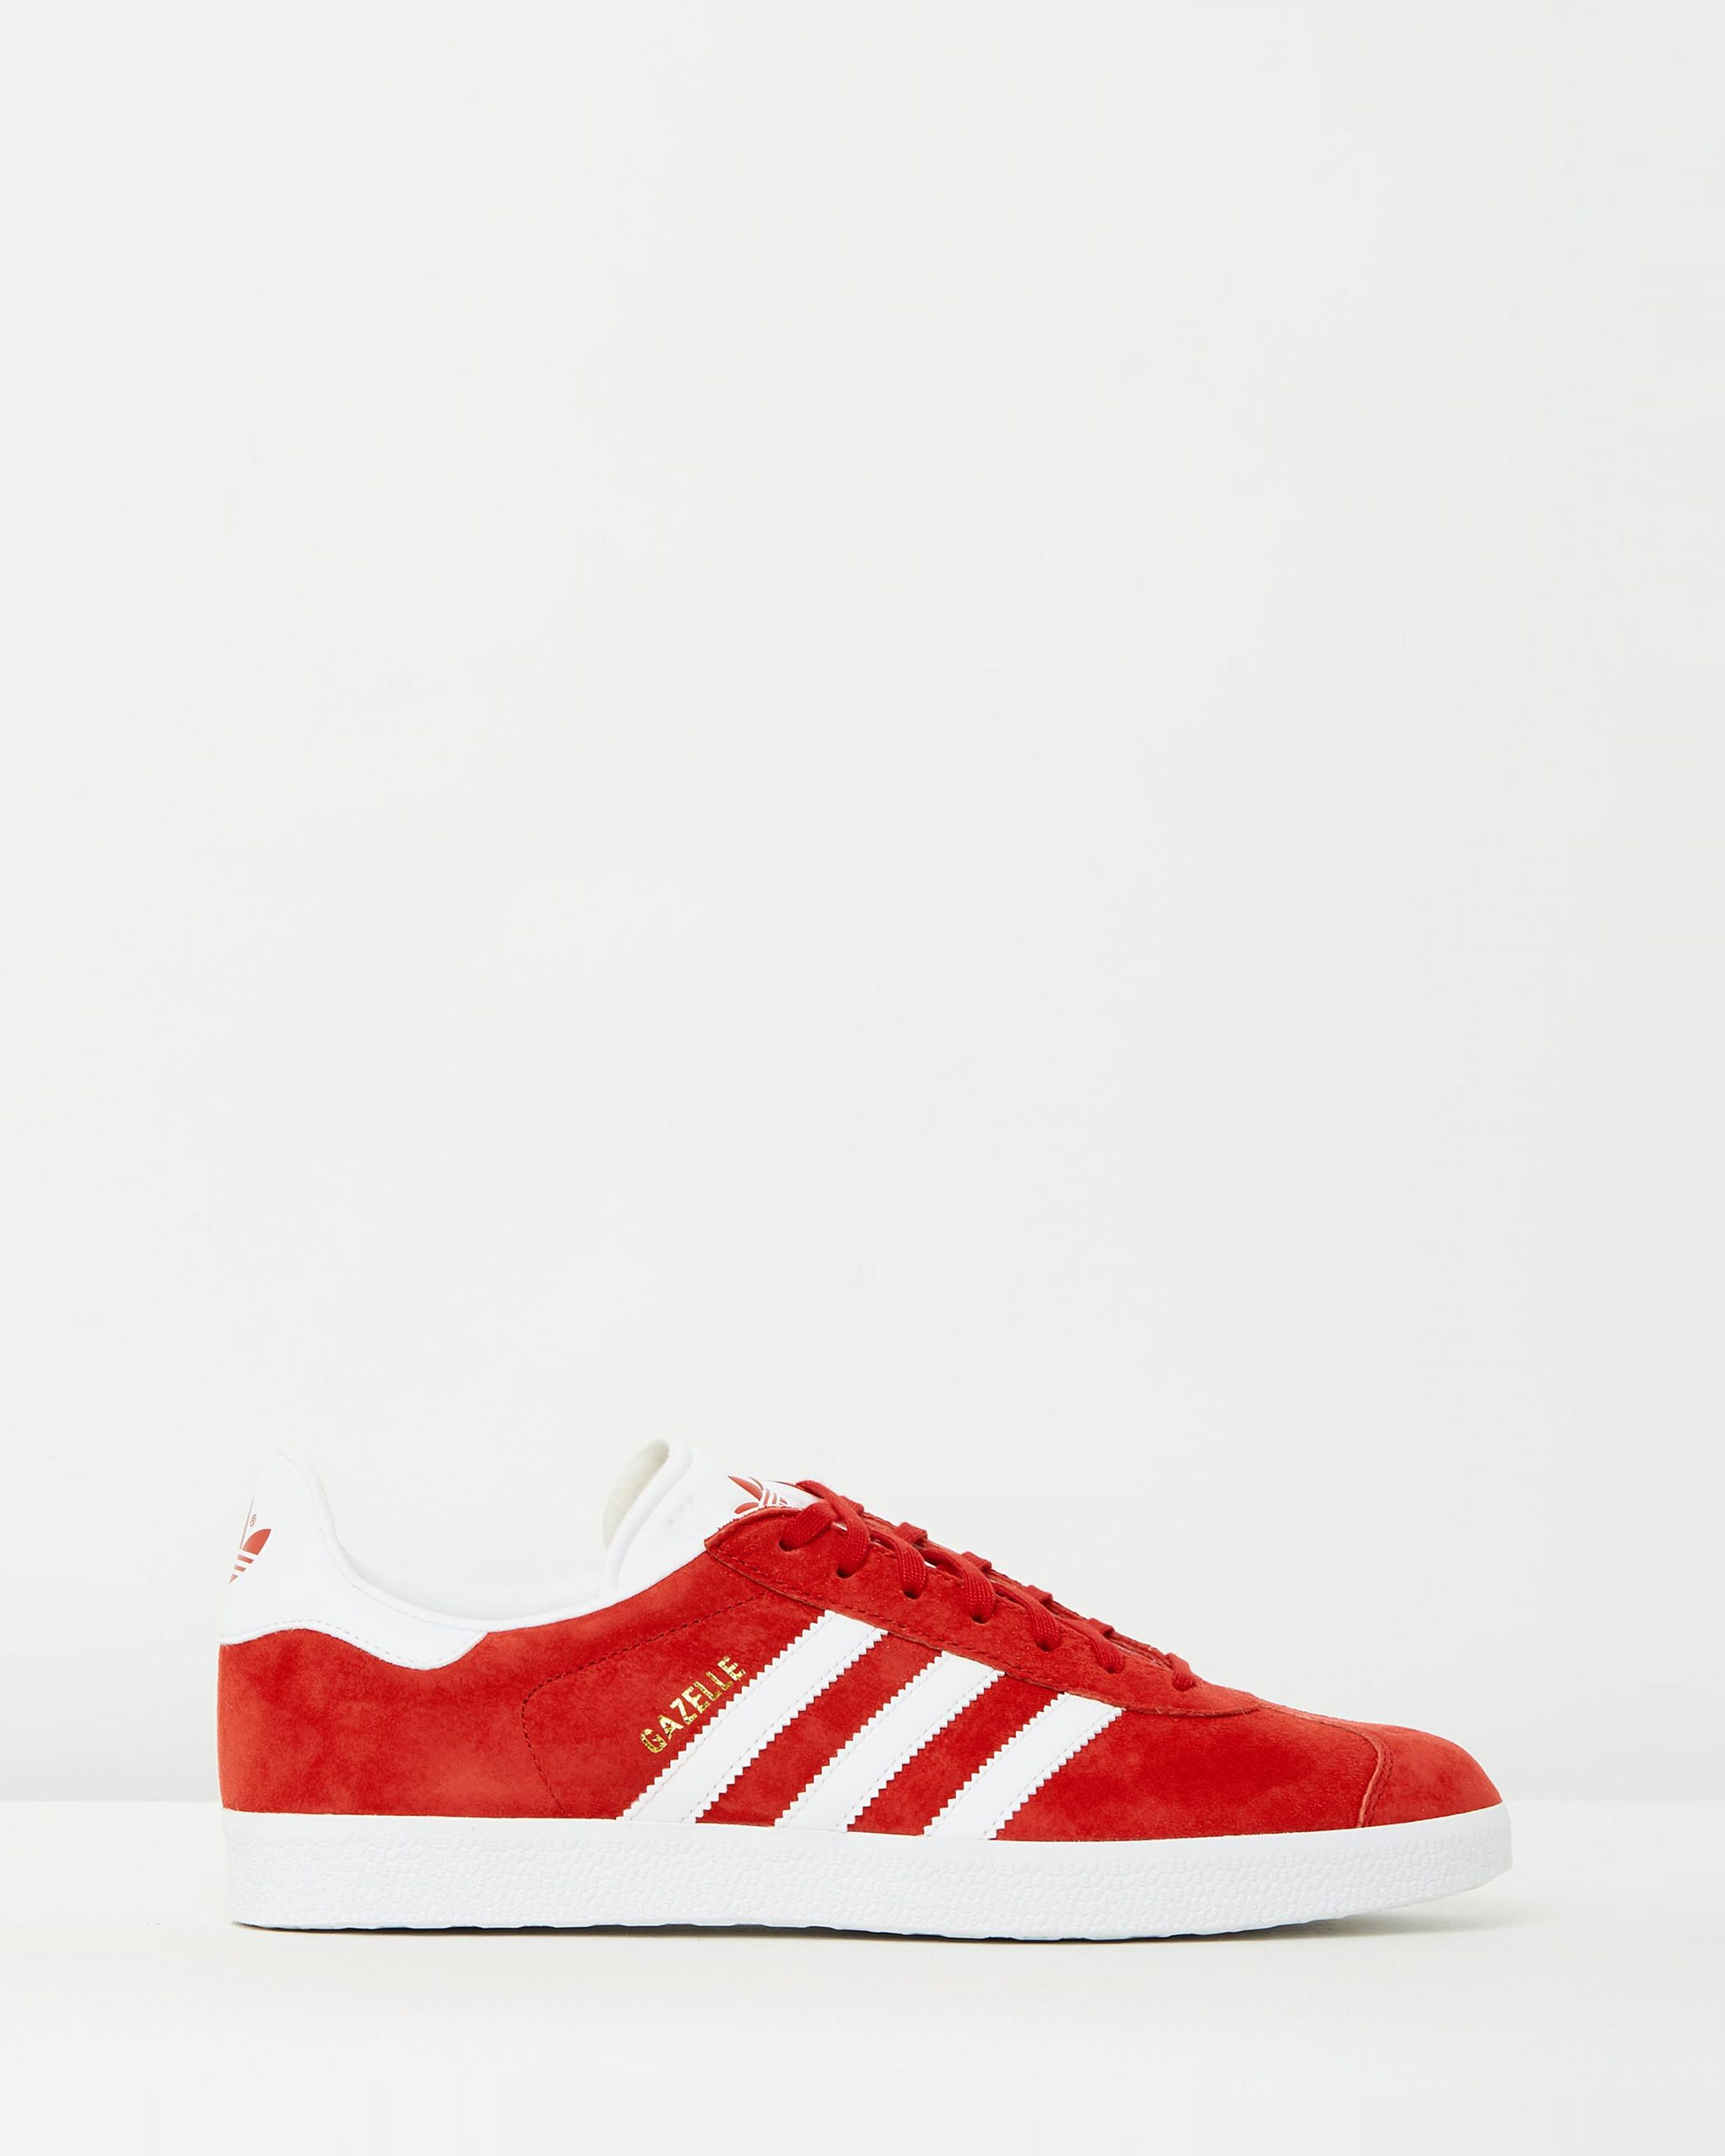 Adidas Men's Gazelle Power Red Sneakers